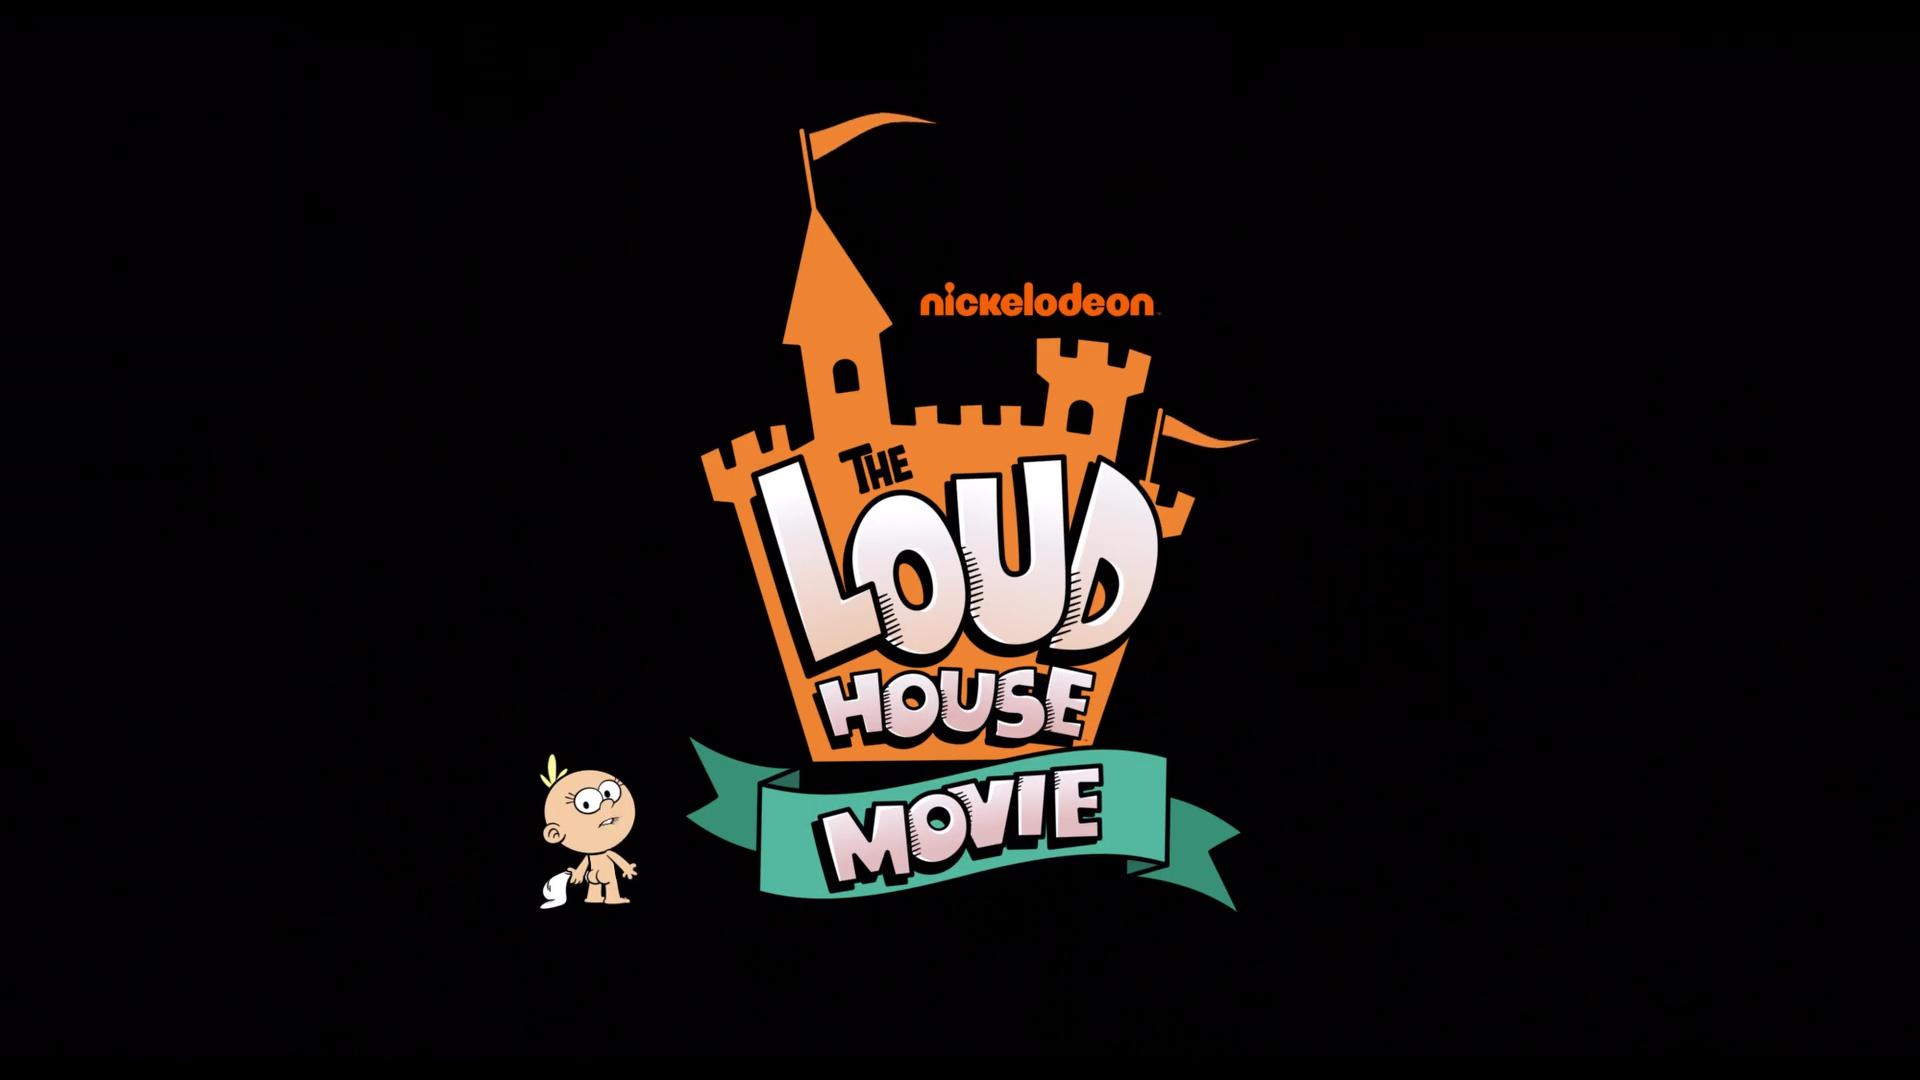 The Loud House: La película (2021) 1080p WEB-DL Latino